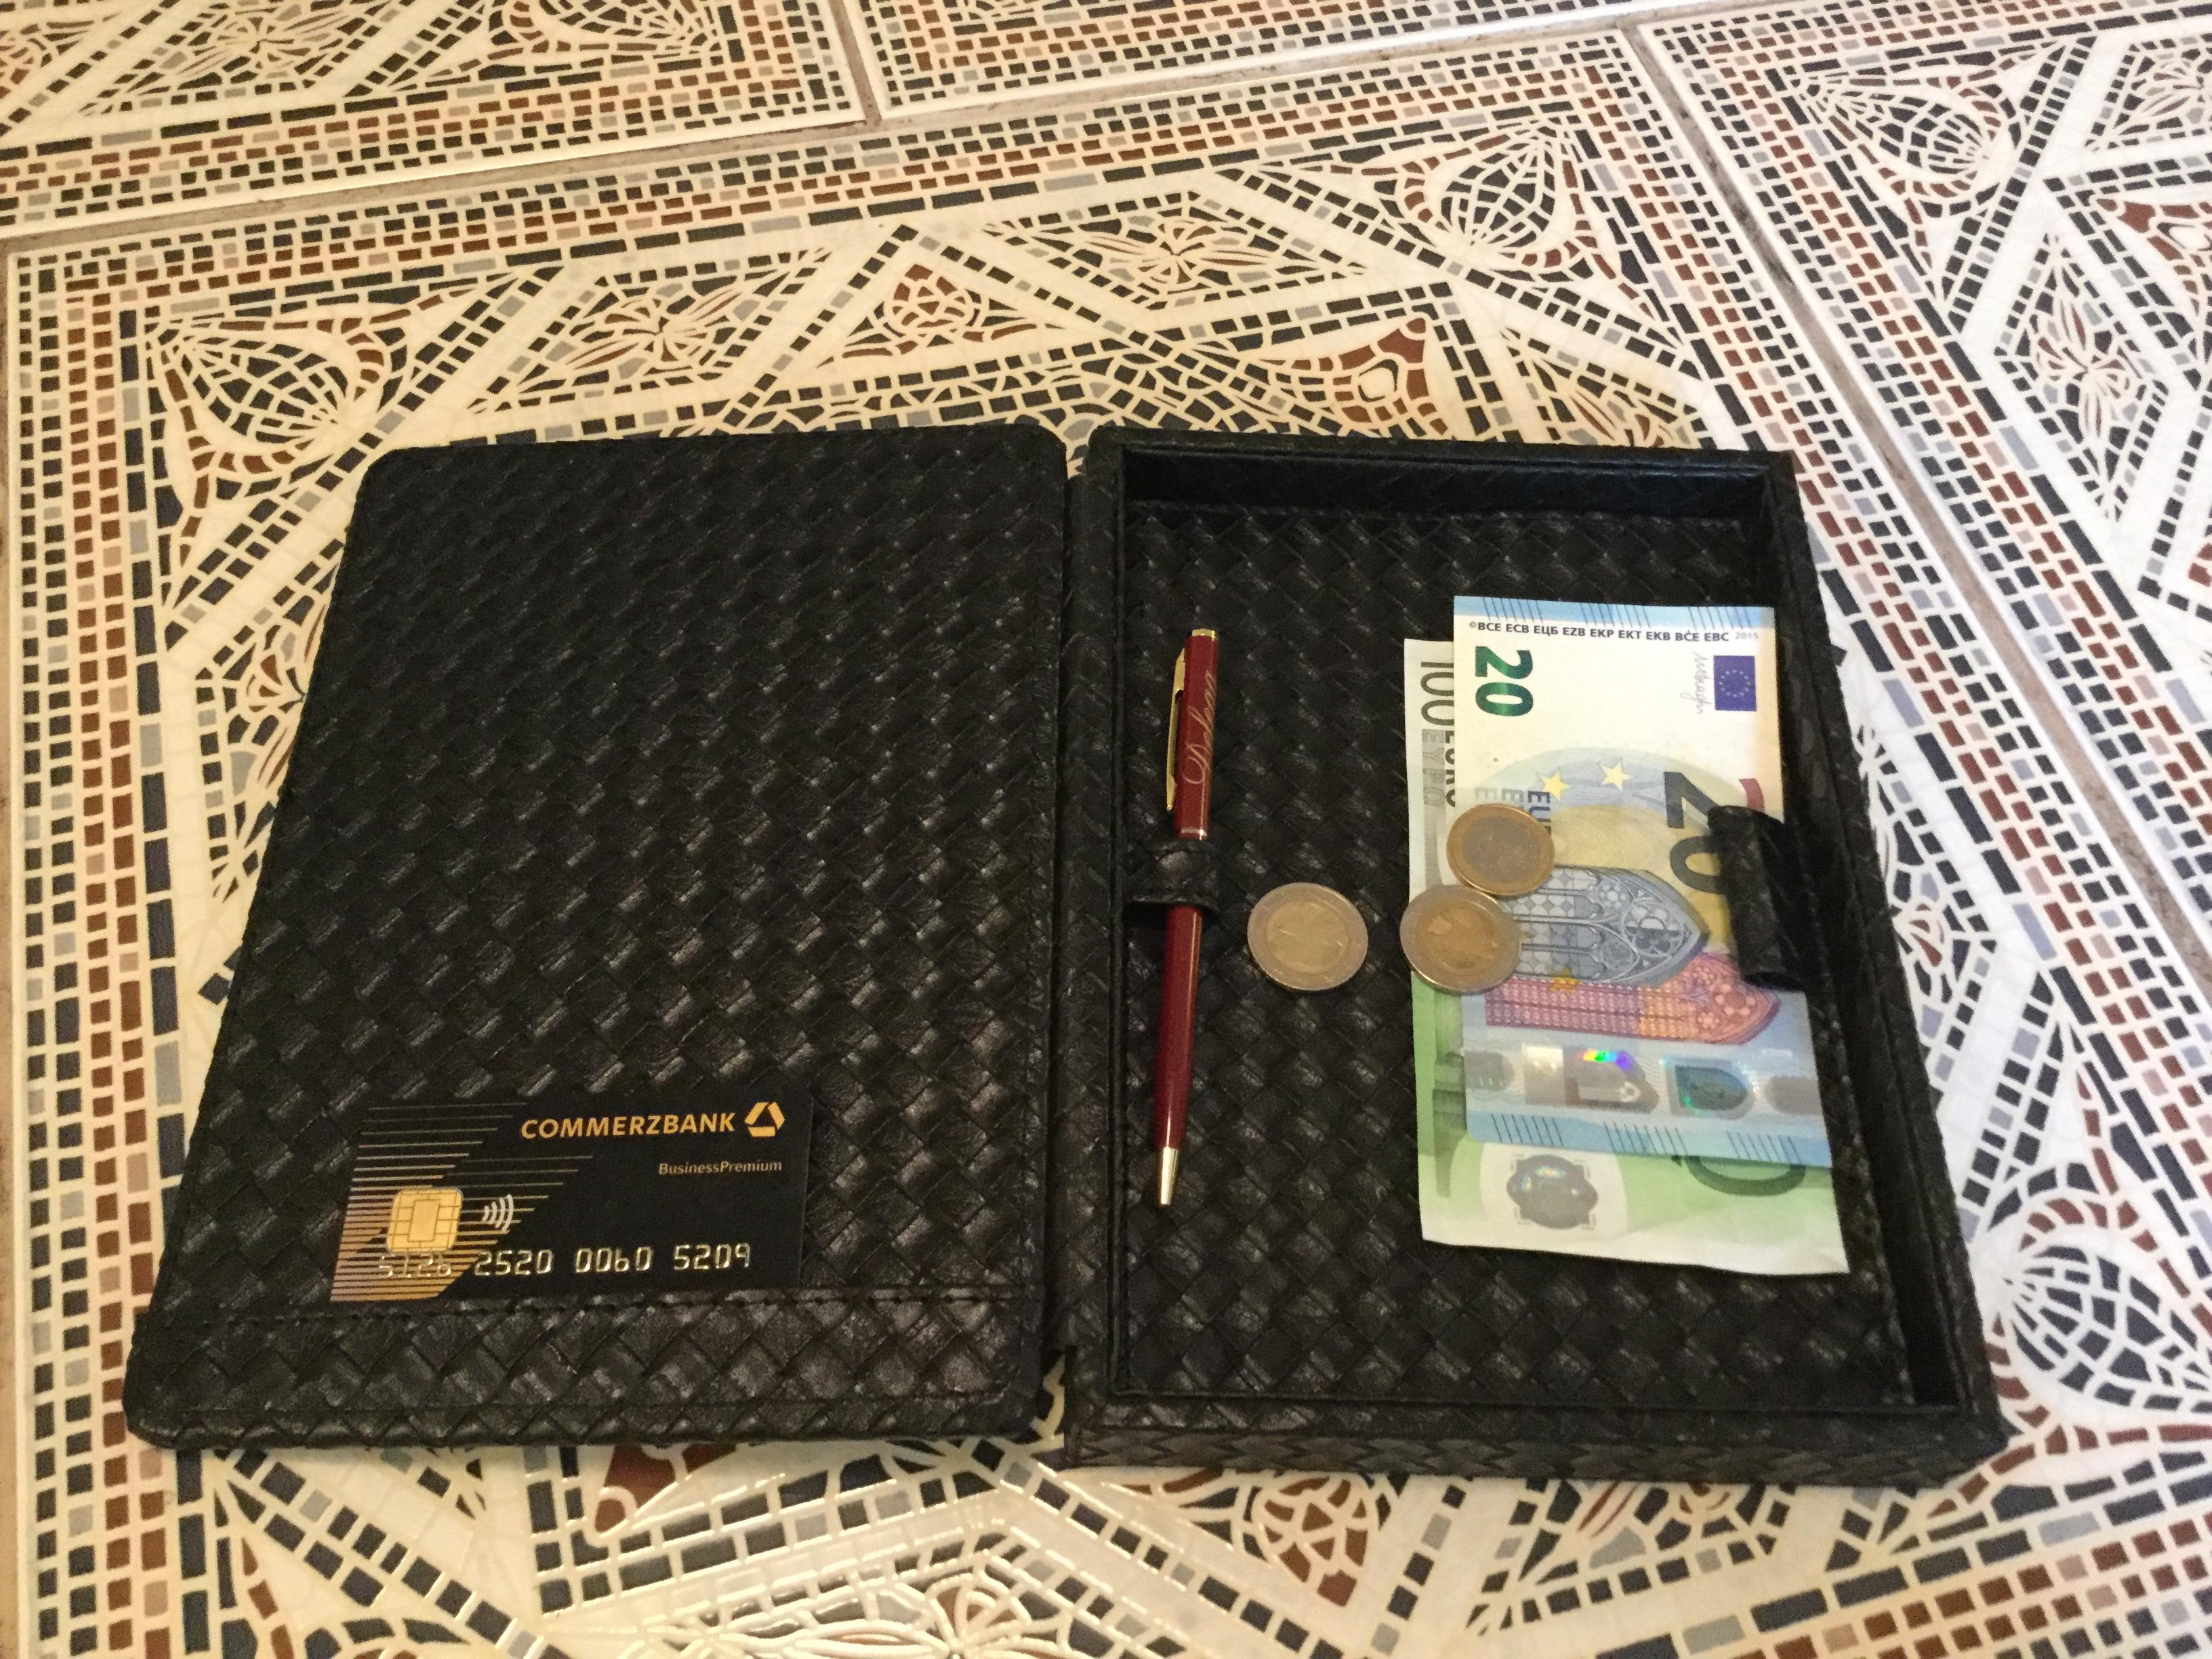 Invoice boxes deleag germany horeca needs bill box reheart Image collections